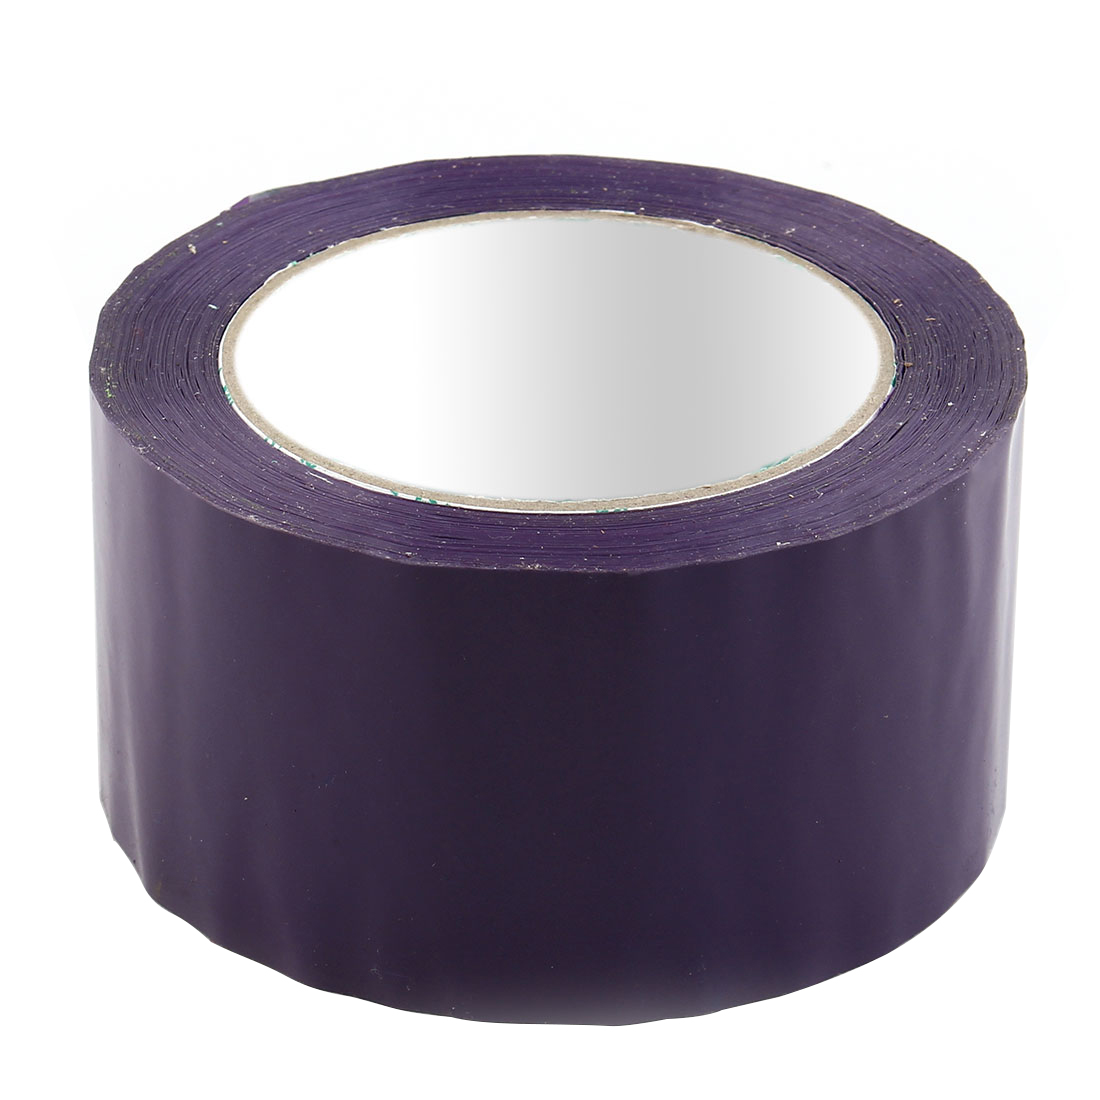 Shipping PVC Box Sealing Adhesive Tape Purple 2.4   x 98.4 Yards(295.3 Ft)